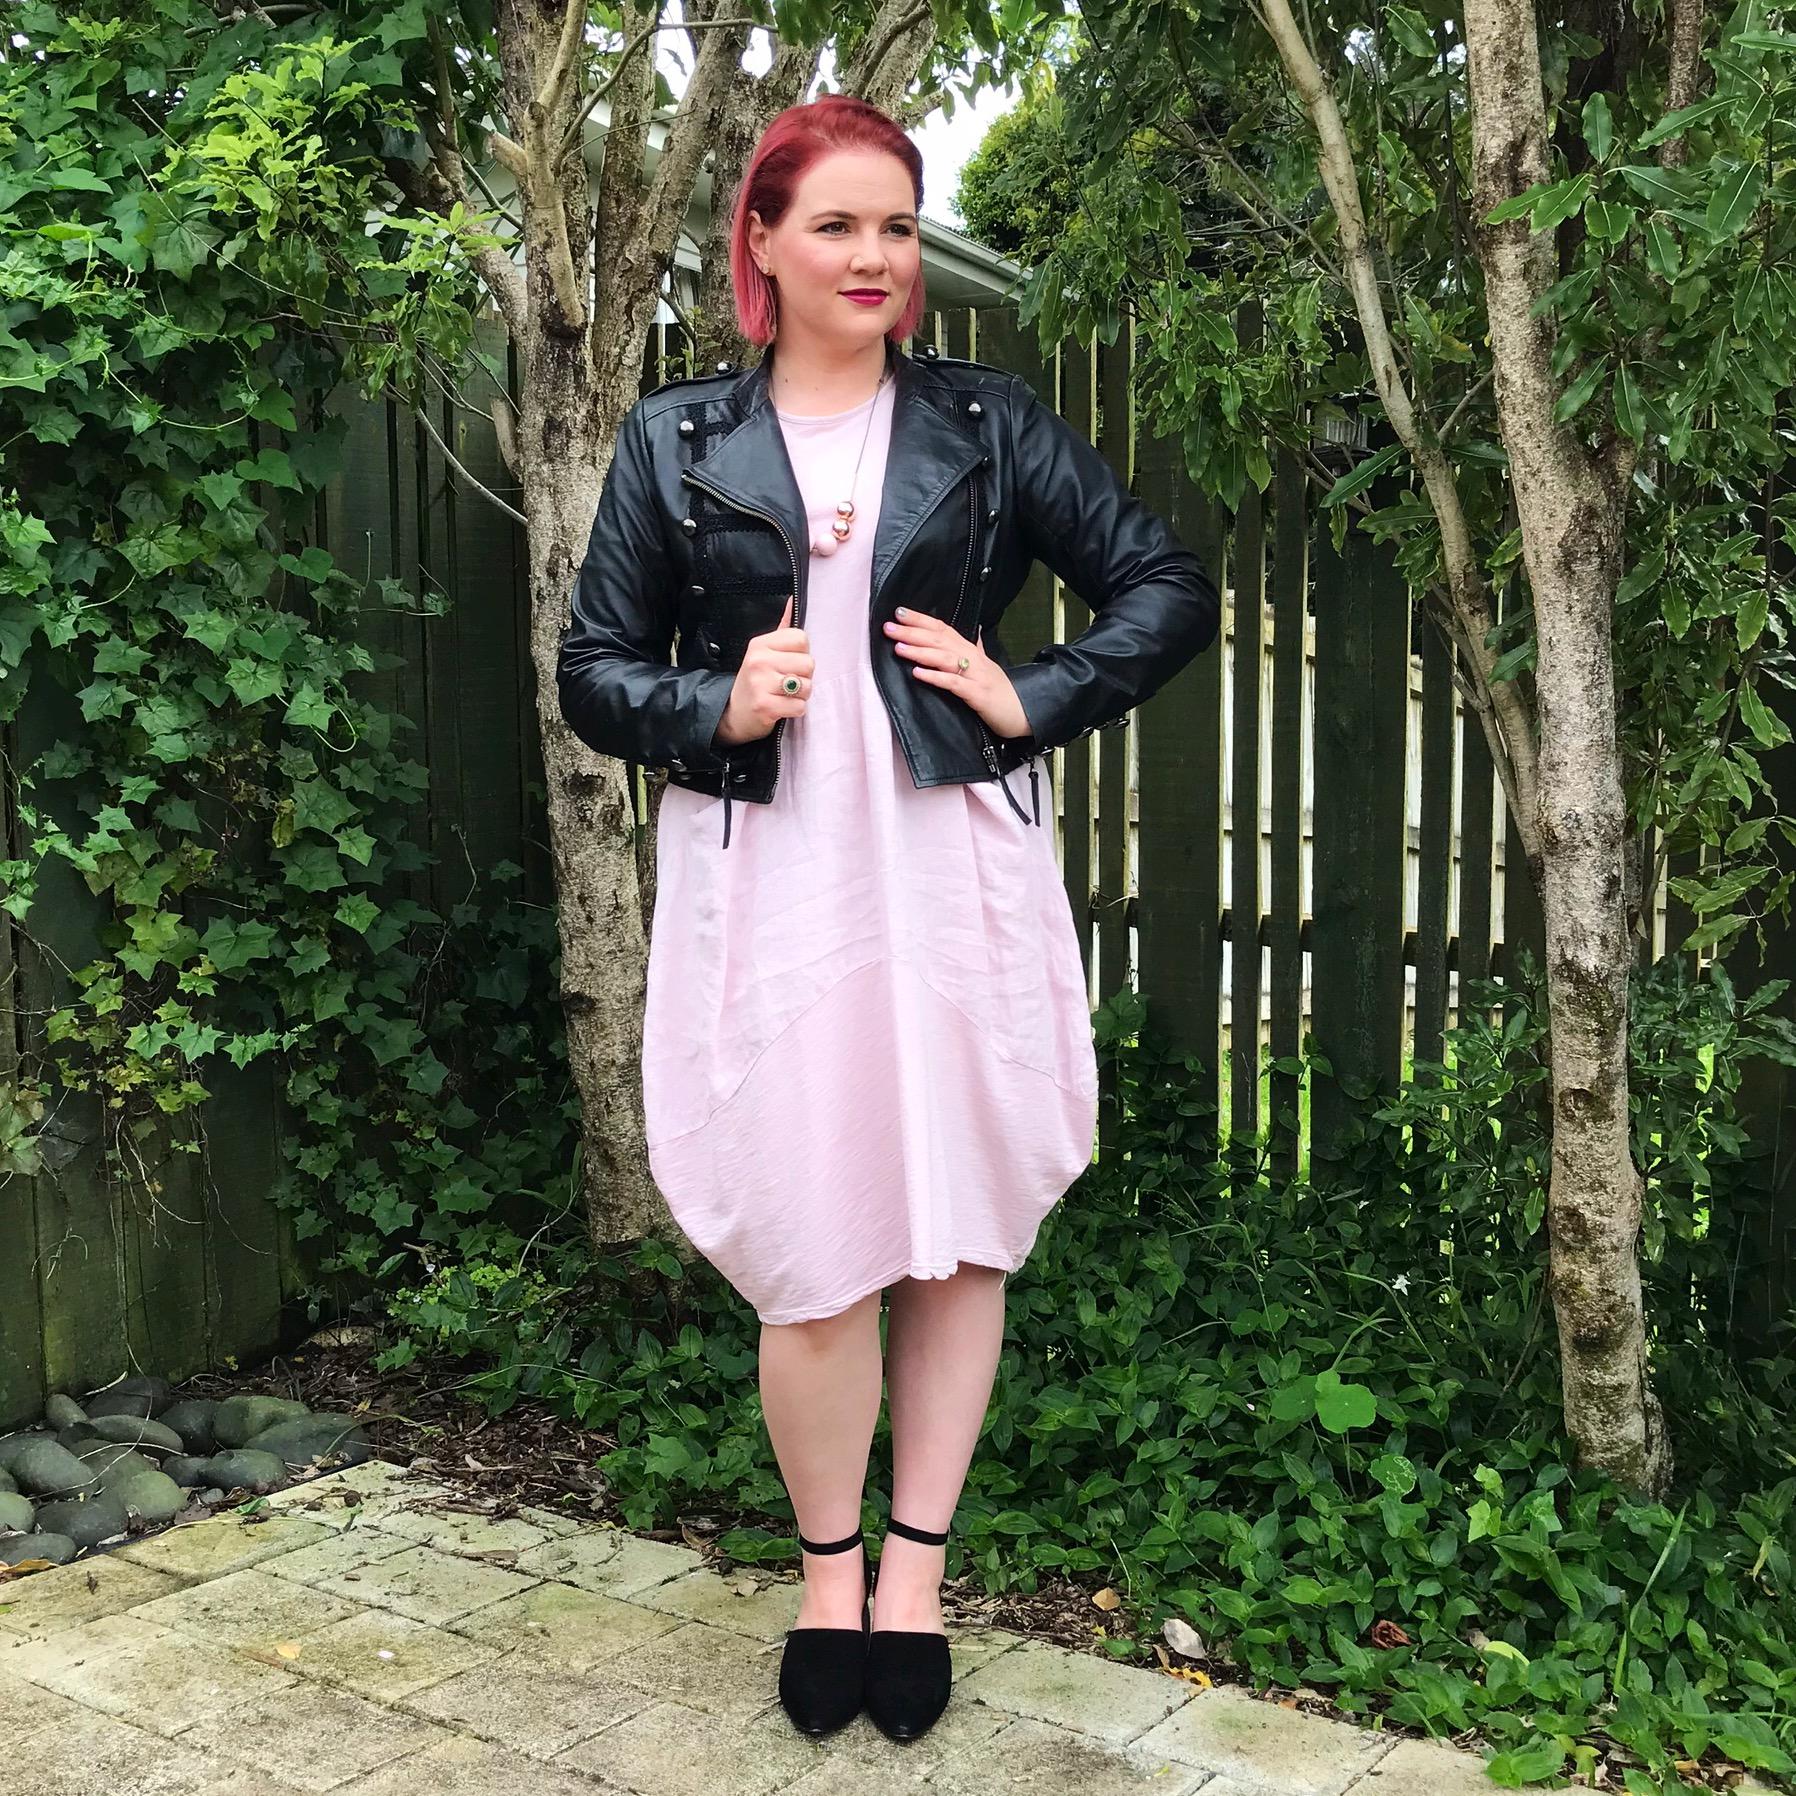 Trelise Cooper jacket, designer recycle dress (no label), Mi Piaci shoes.